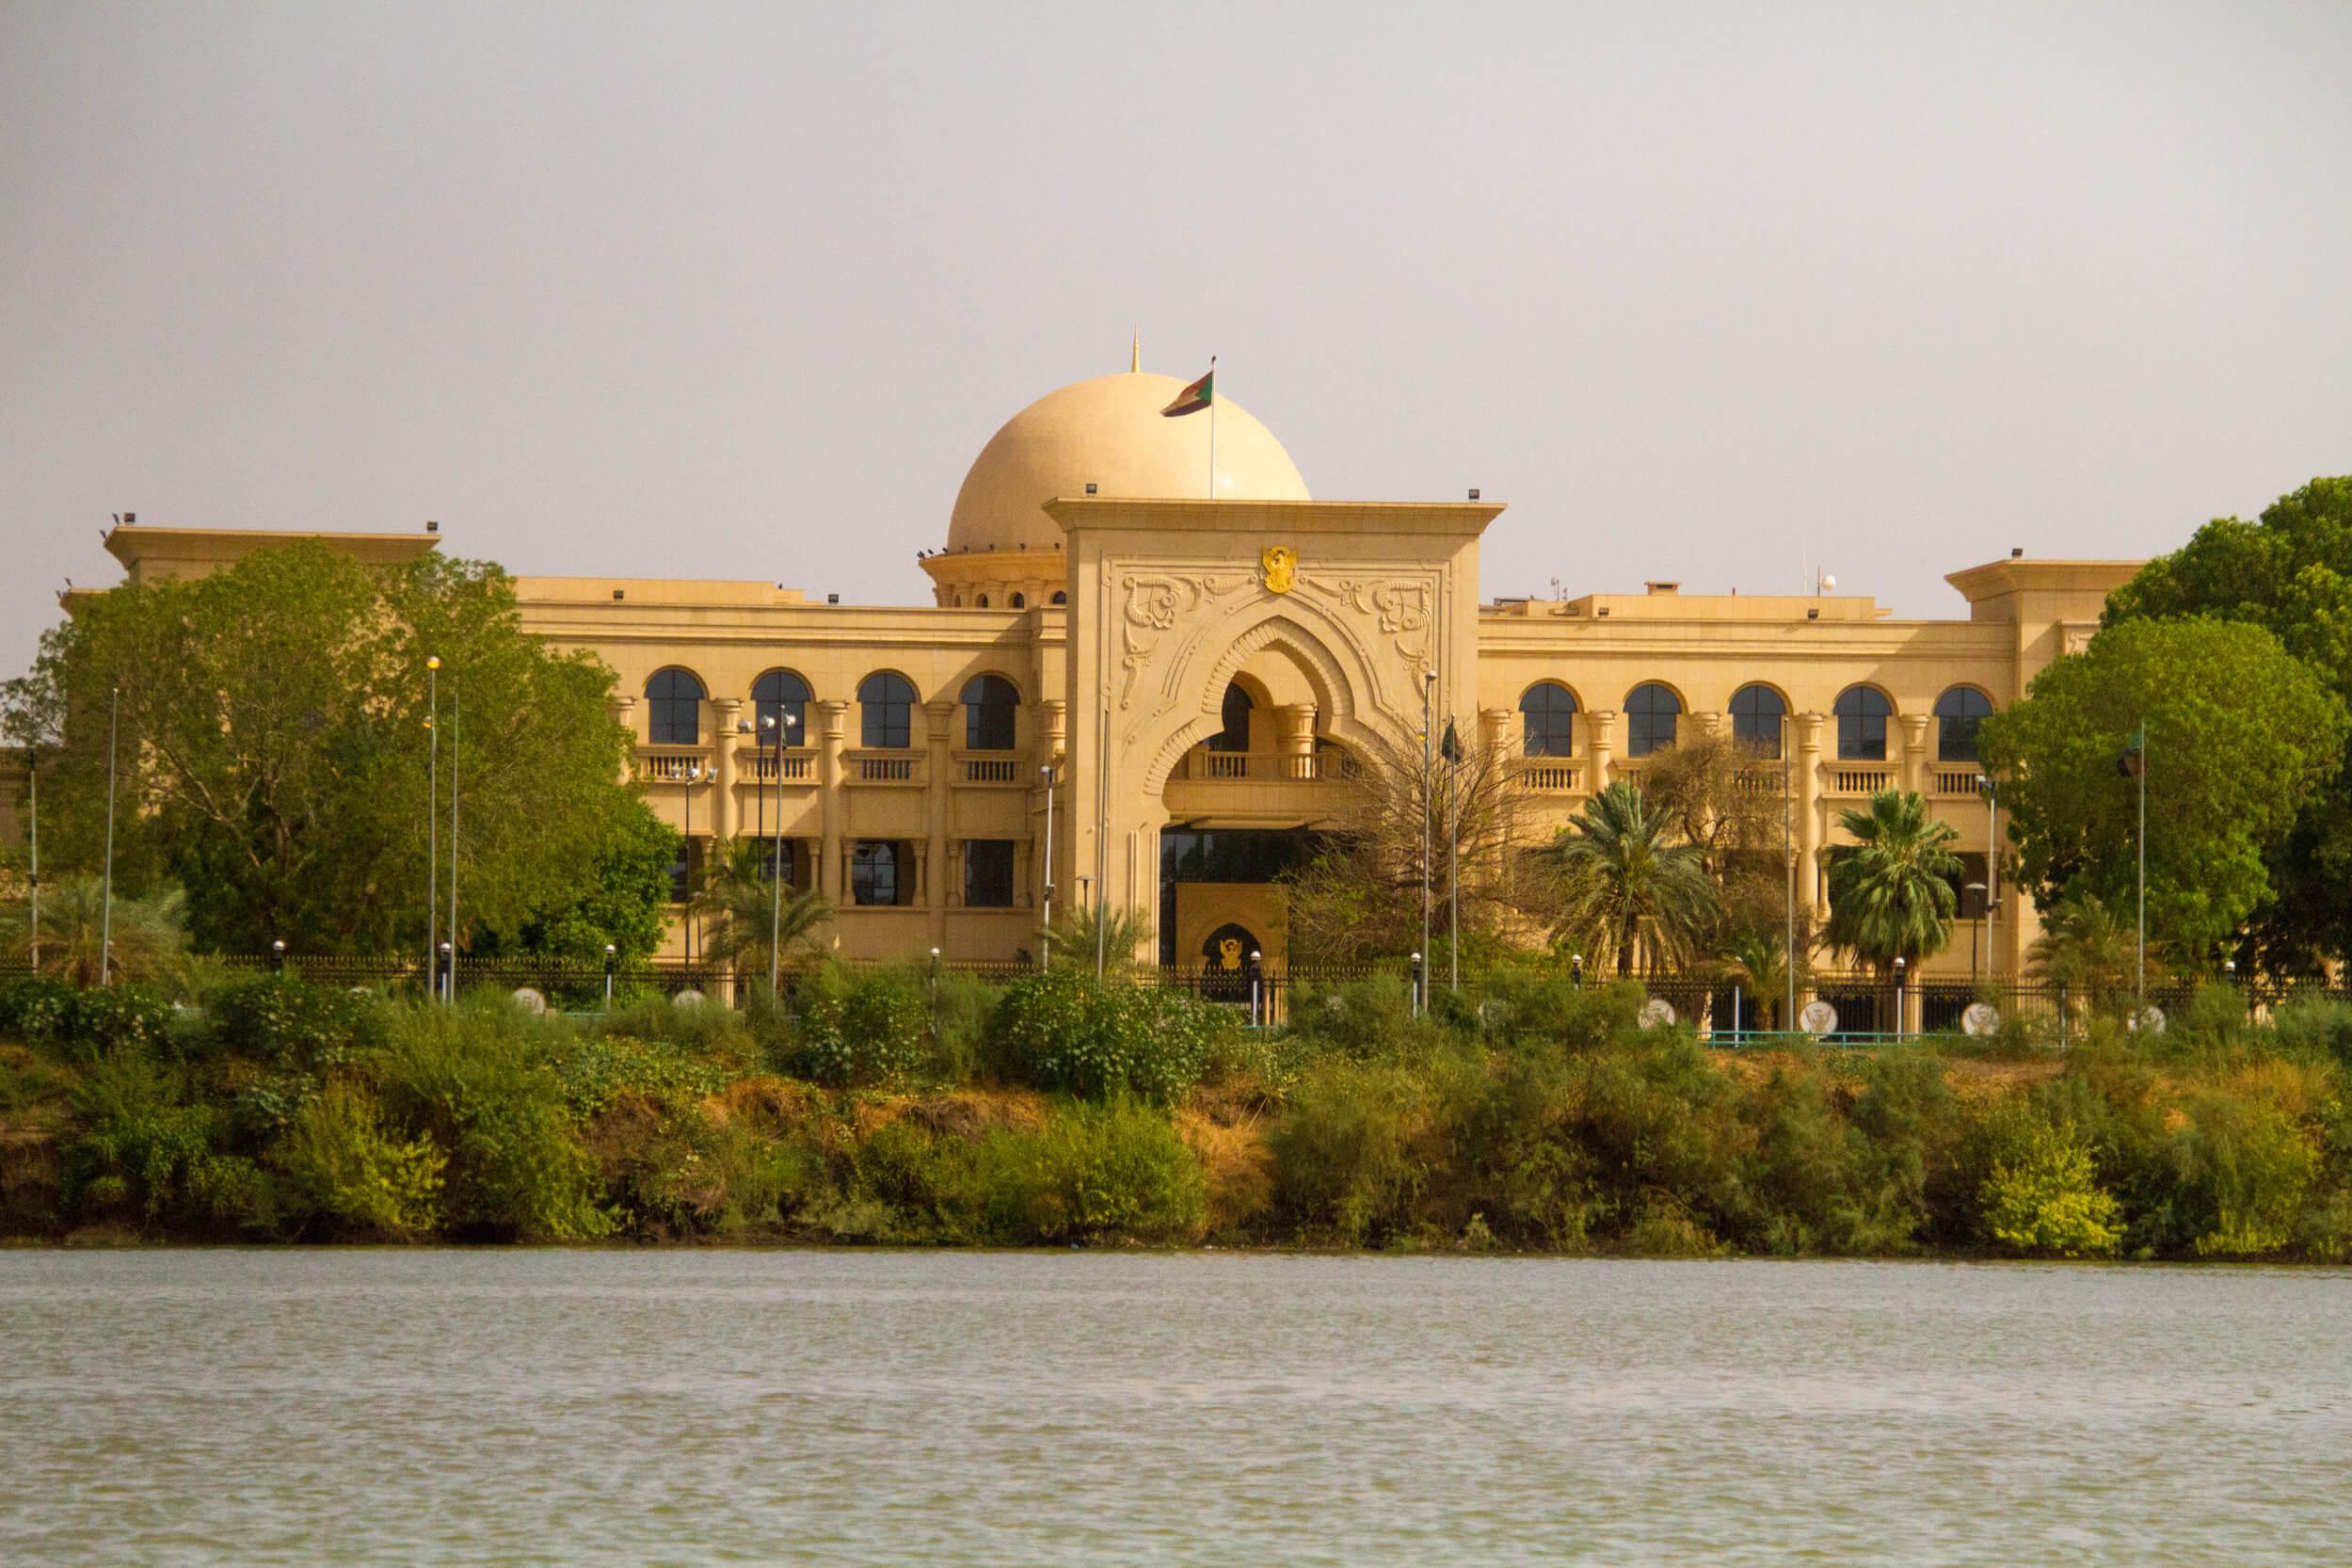 https://bubo.sk/uploads/galleries/7407/marekmeluch_sudan_khartoum_palace.jpg